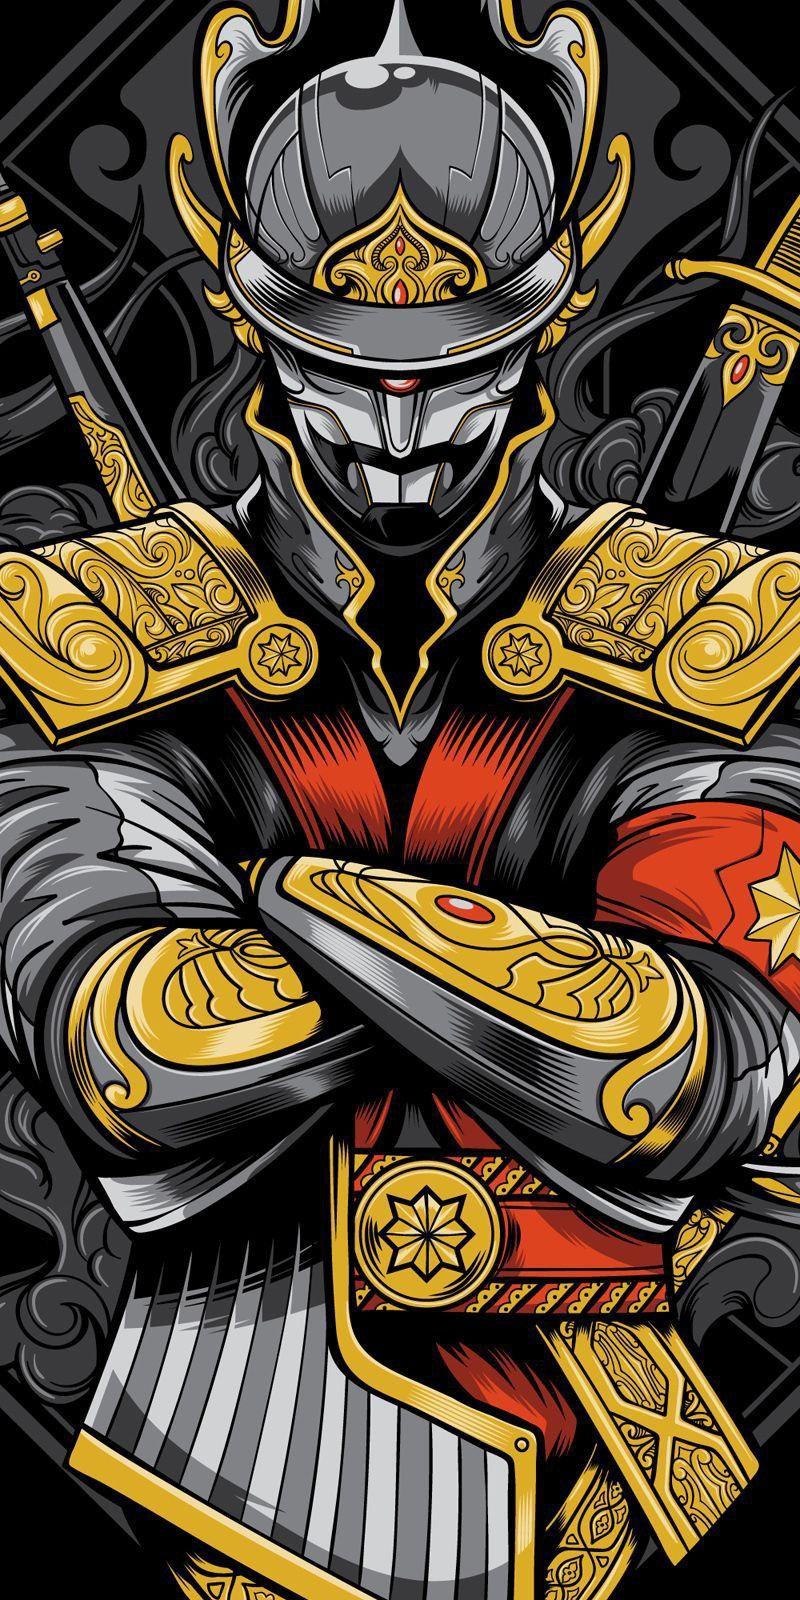 {title} (Dengan gambar) Samurai, Seni jepang, Gambar